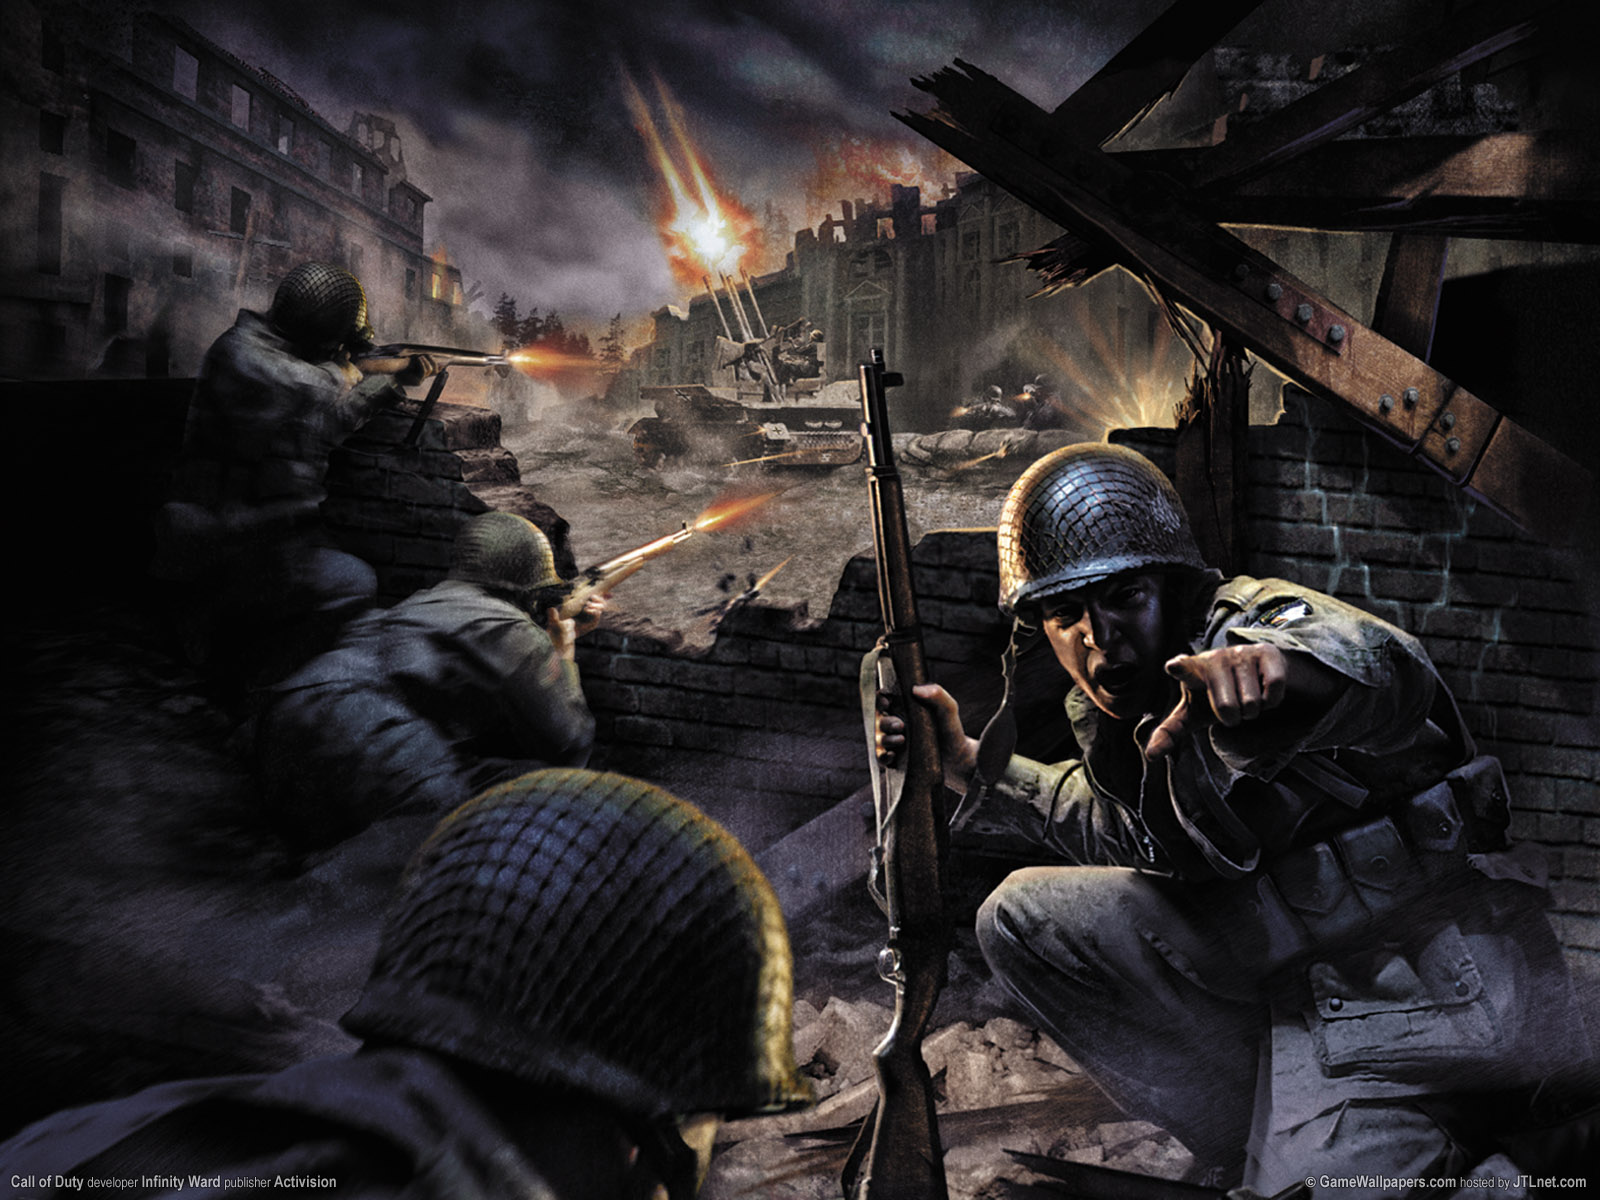 http://2.bp.blogspot.com/_lyX23yMmStY/TRM6DRfPjSI/AAAAAAAAAAg/EyzjvlsVCMc/s1600/wallpaper_call_of_duty_02_1600.jpg